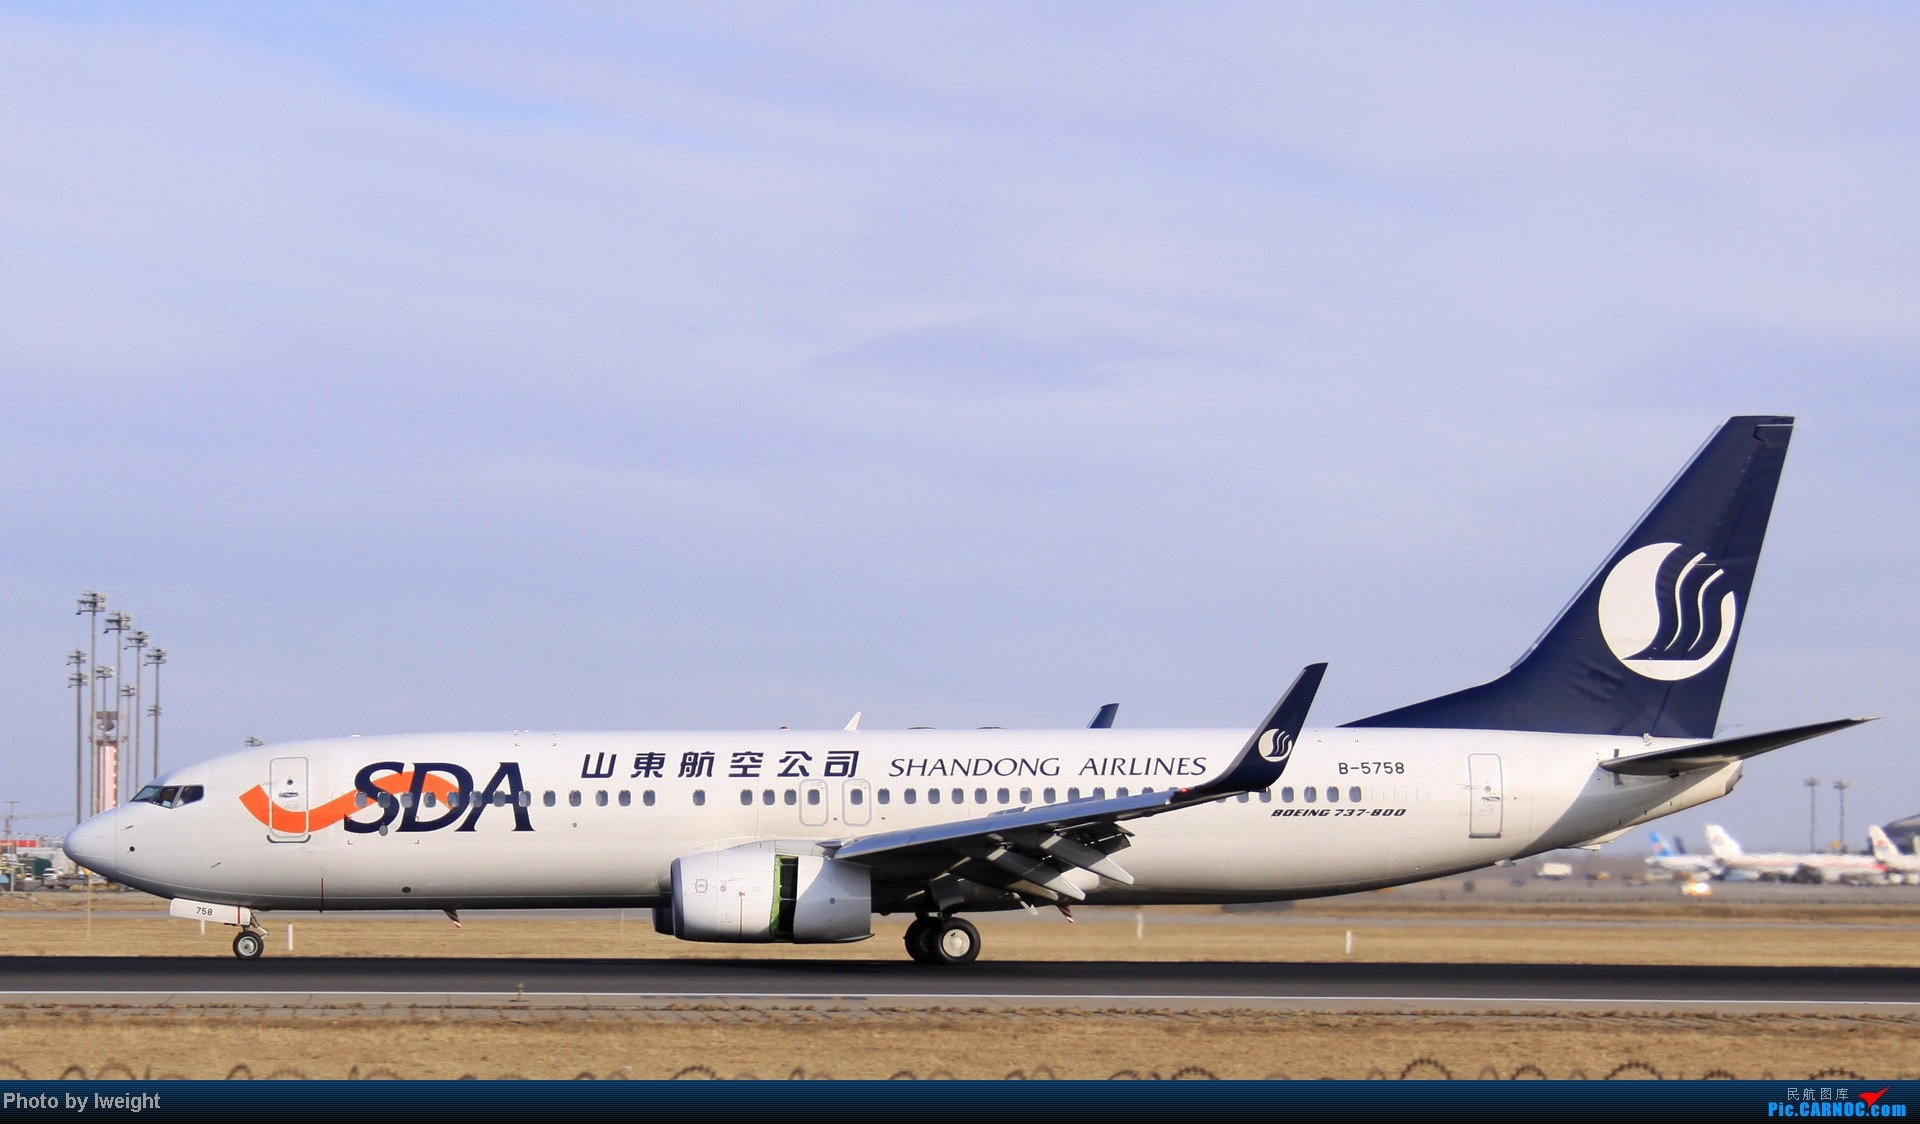 Re:[原创]今天下午瞎拍两个小时的杂图 BOEING 737-800 B-5758 中国北京首都机场